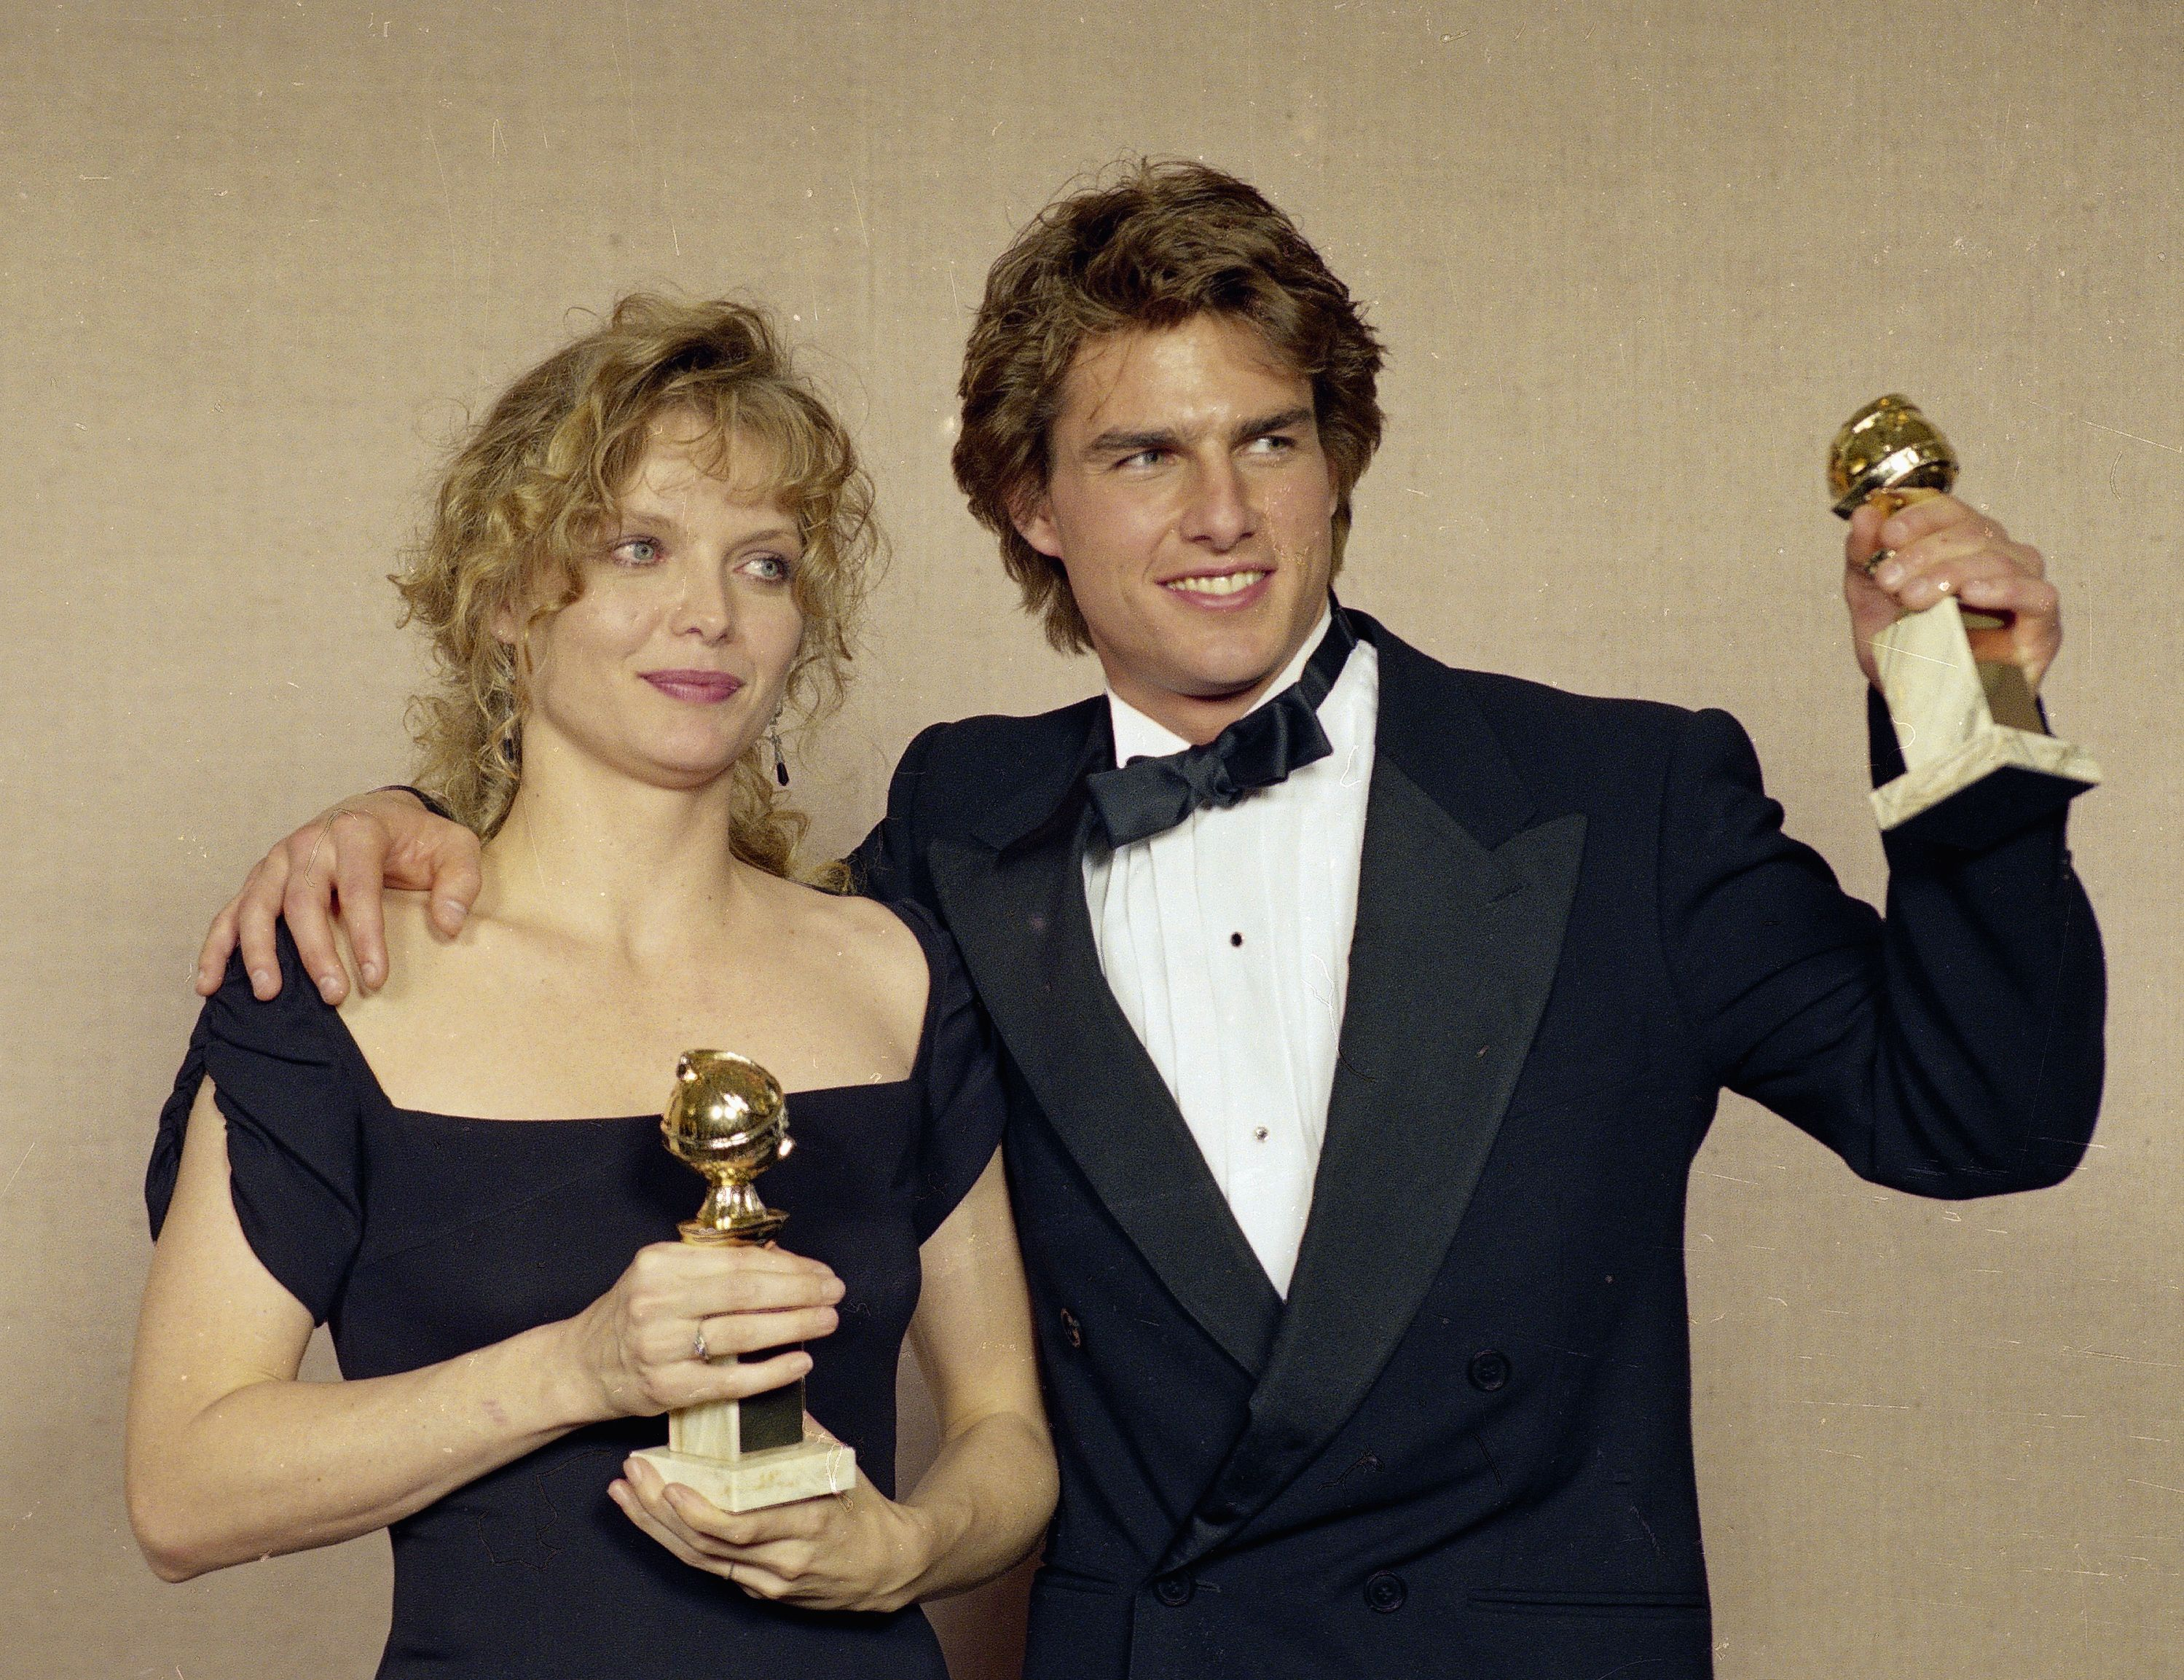 Photo finish: Golden Globe memories | Tom cruise, Golden globe winners,  Michelle pfeiffer